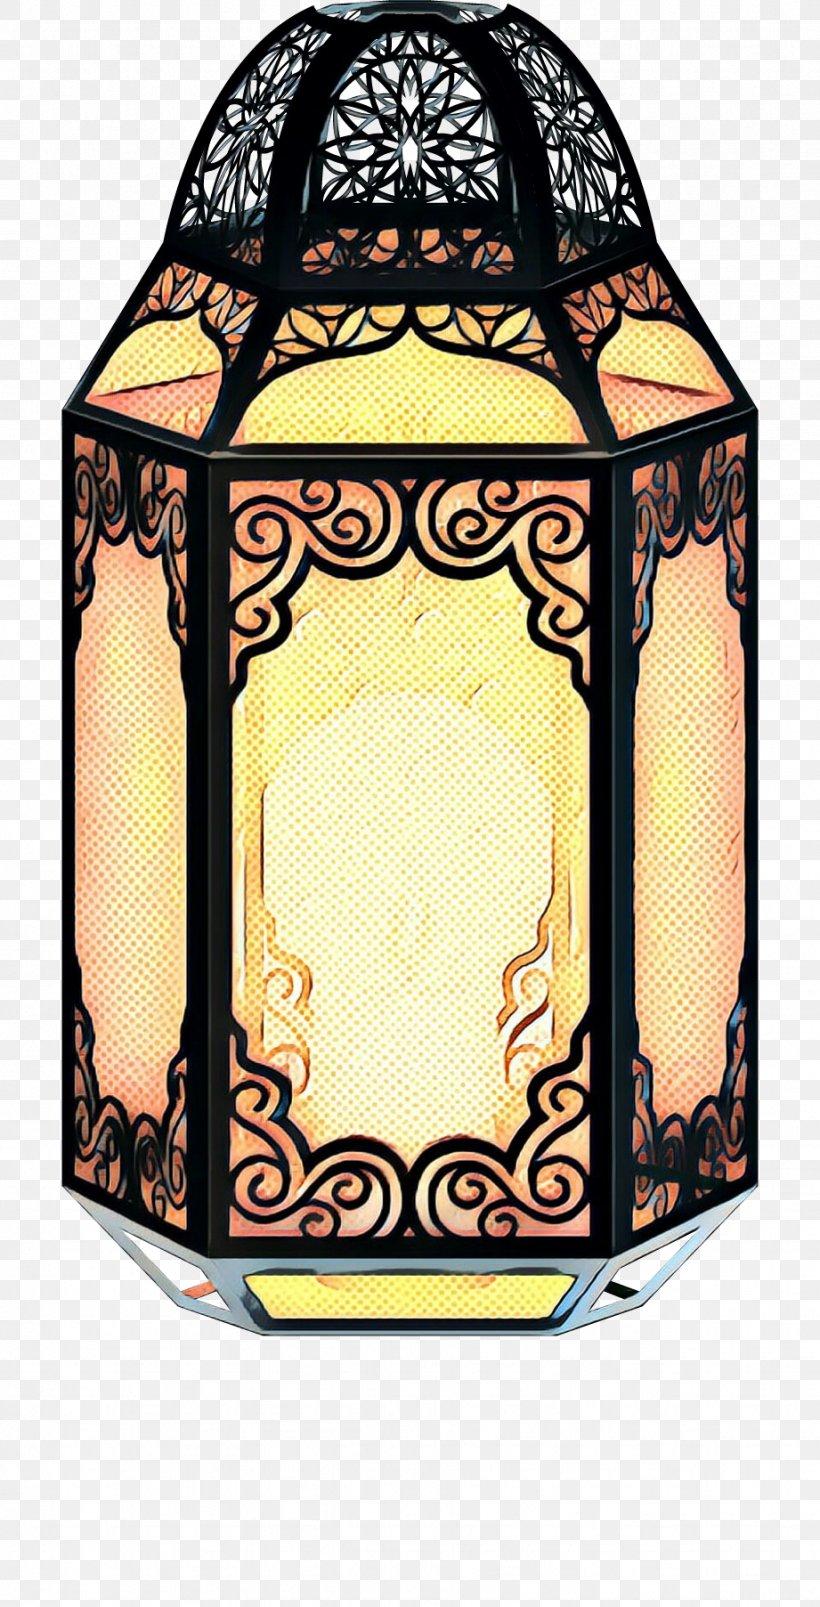 Ramadhan Lamp Png : ramadhan, Ramadan, Fanous, Lantern,, 921x1805px,, Ramadan,, Candle, Holder,, Ceiling, Fixture,, Crescent,, Download